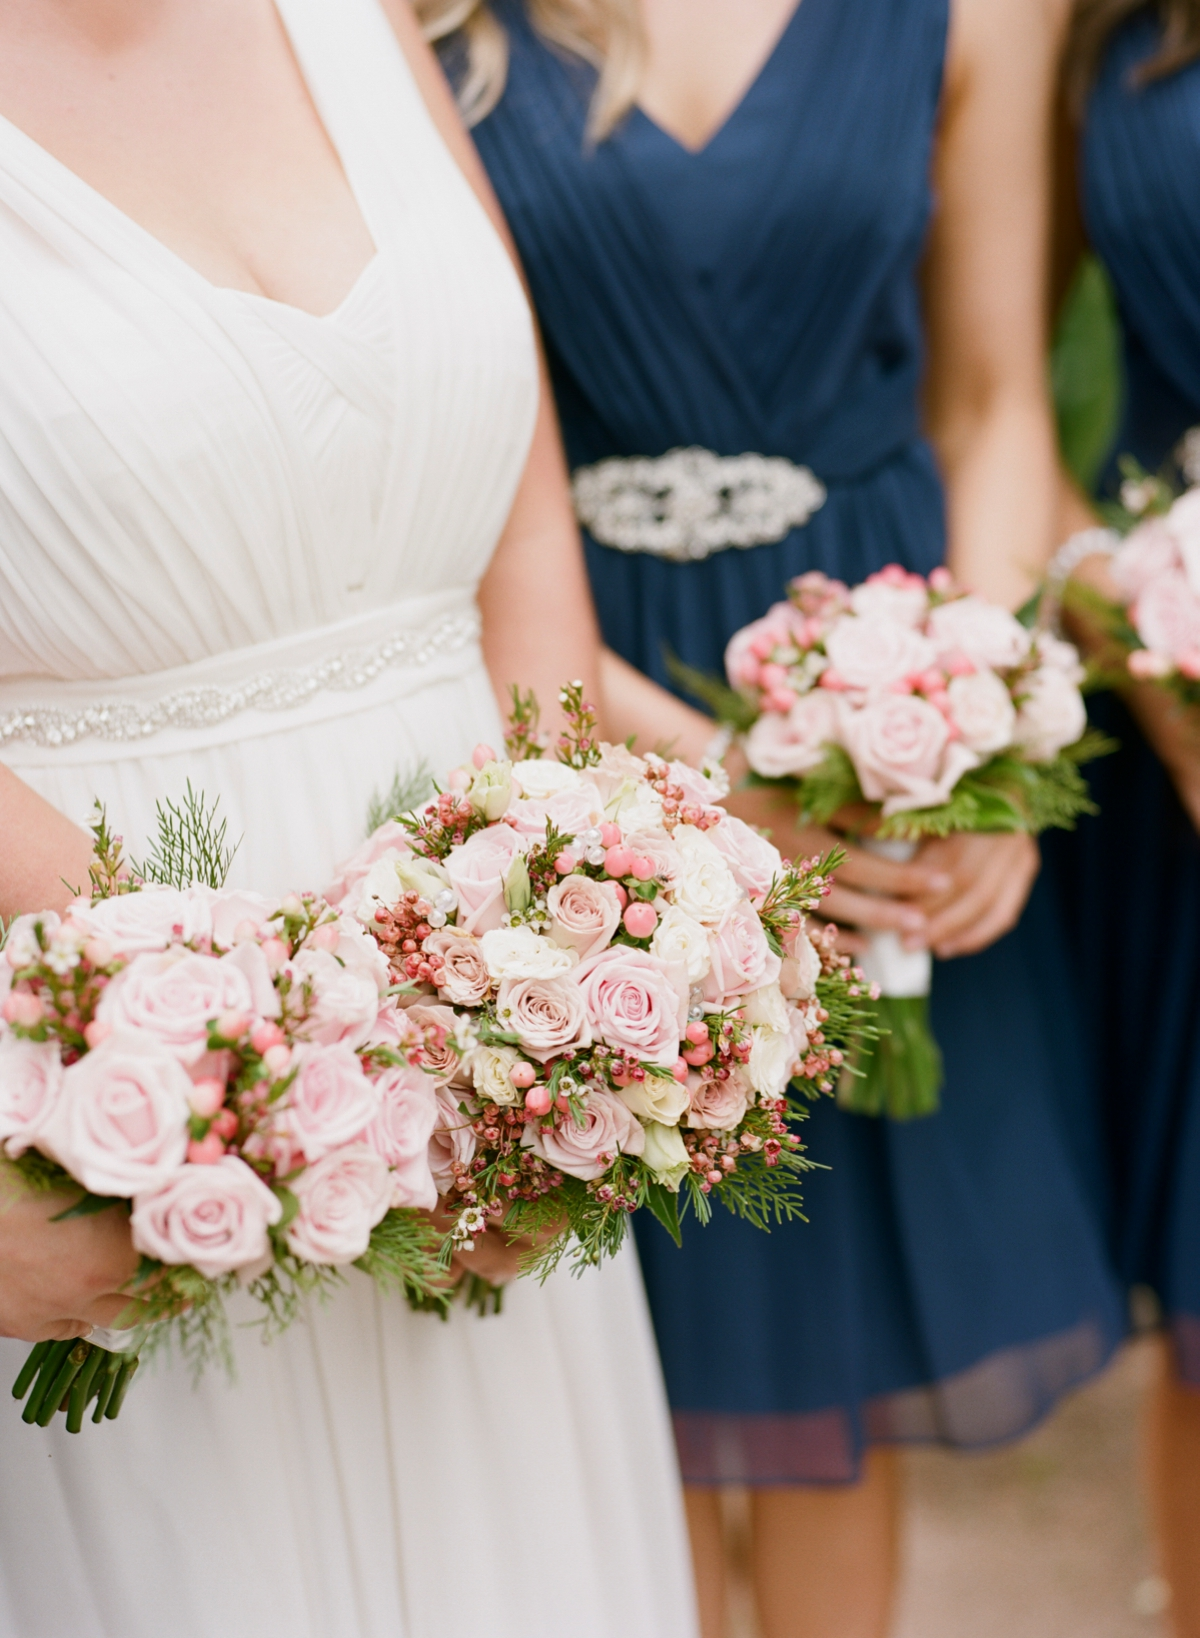 Monterose berry farm wedding by Mr Edwards Photography_0726.jpg